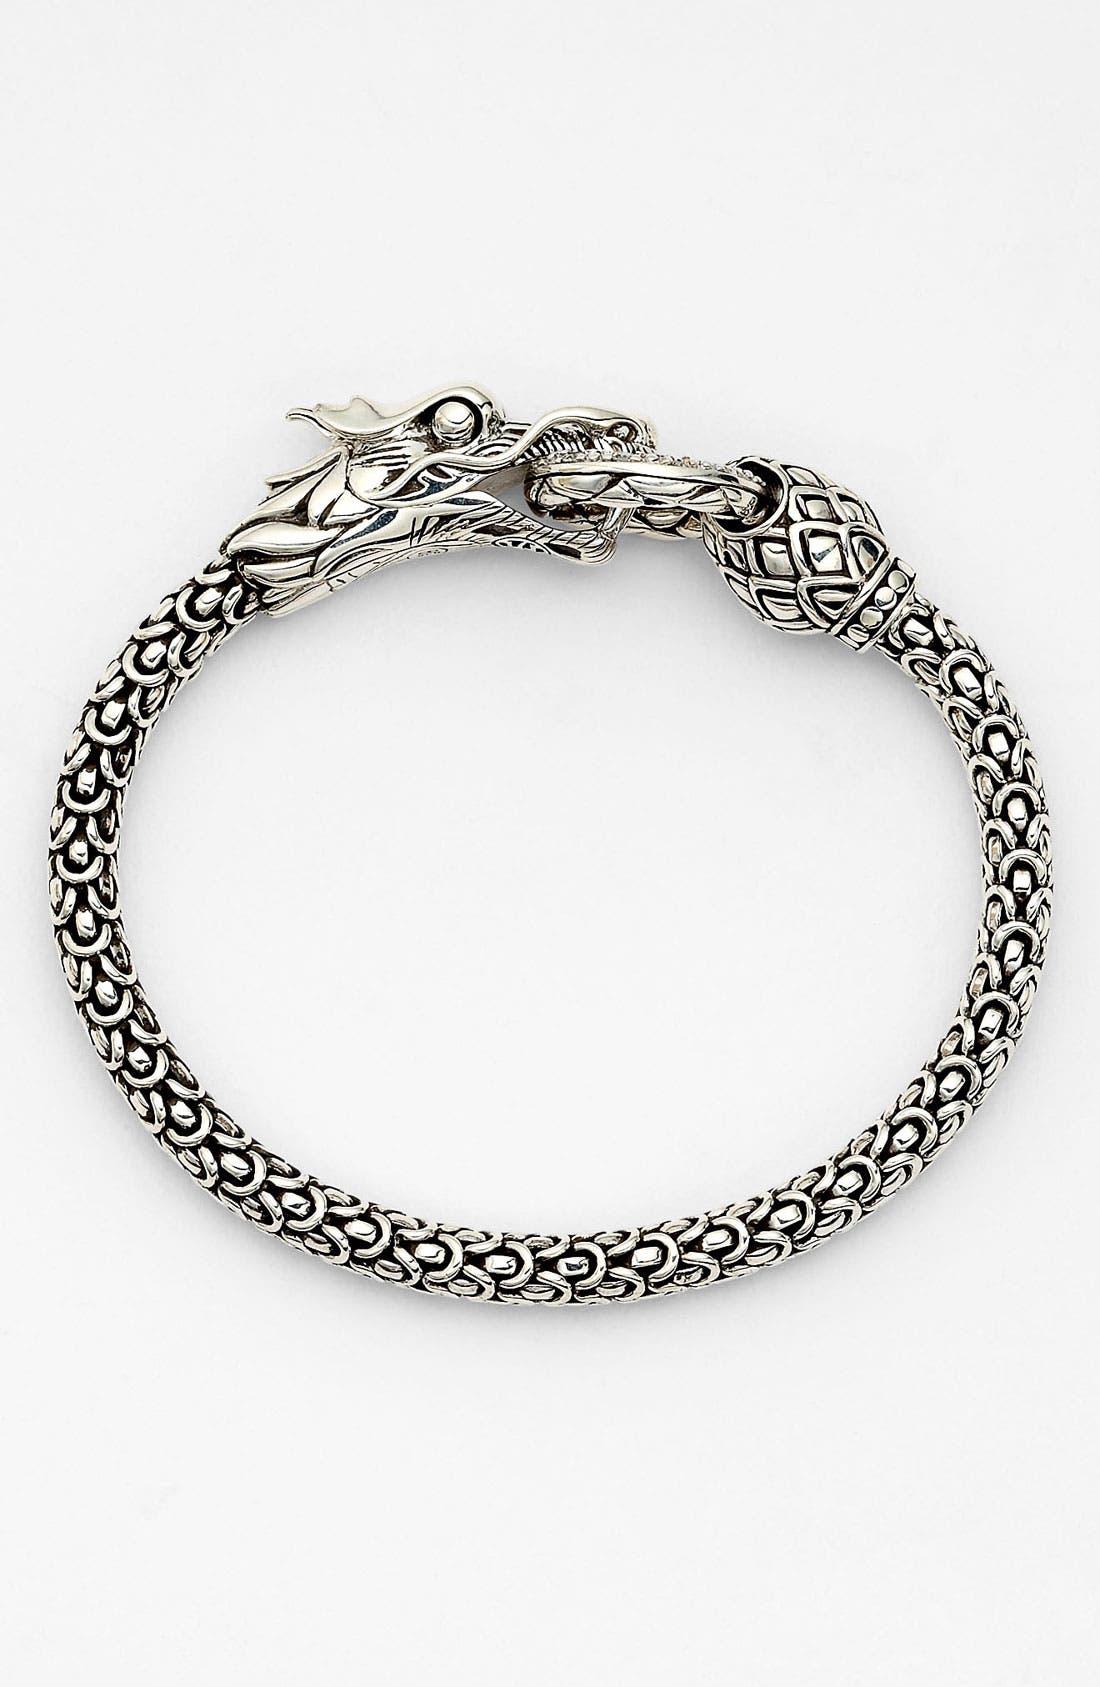 'Naga' Dragon Bracelet,                         Main,                         color, SILVER/ DIAMOND